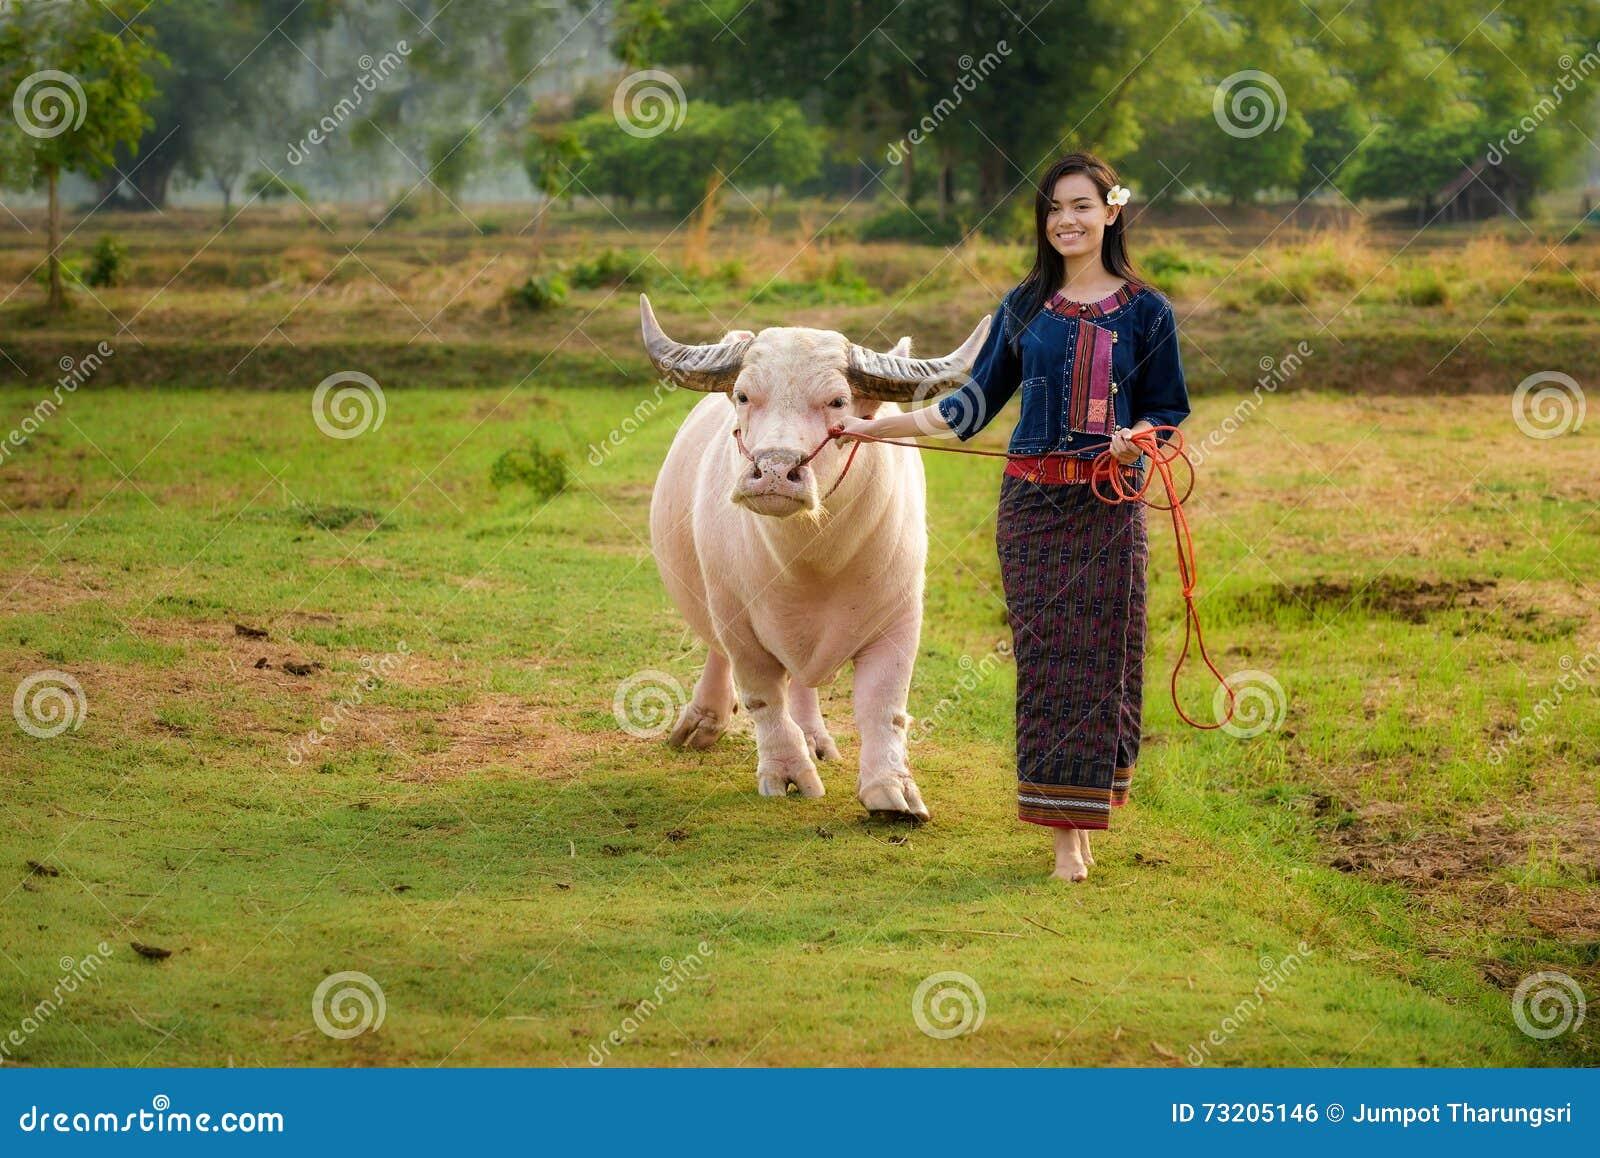 Asian girl with buffalo